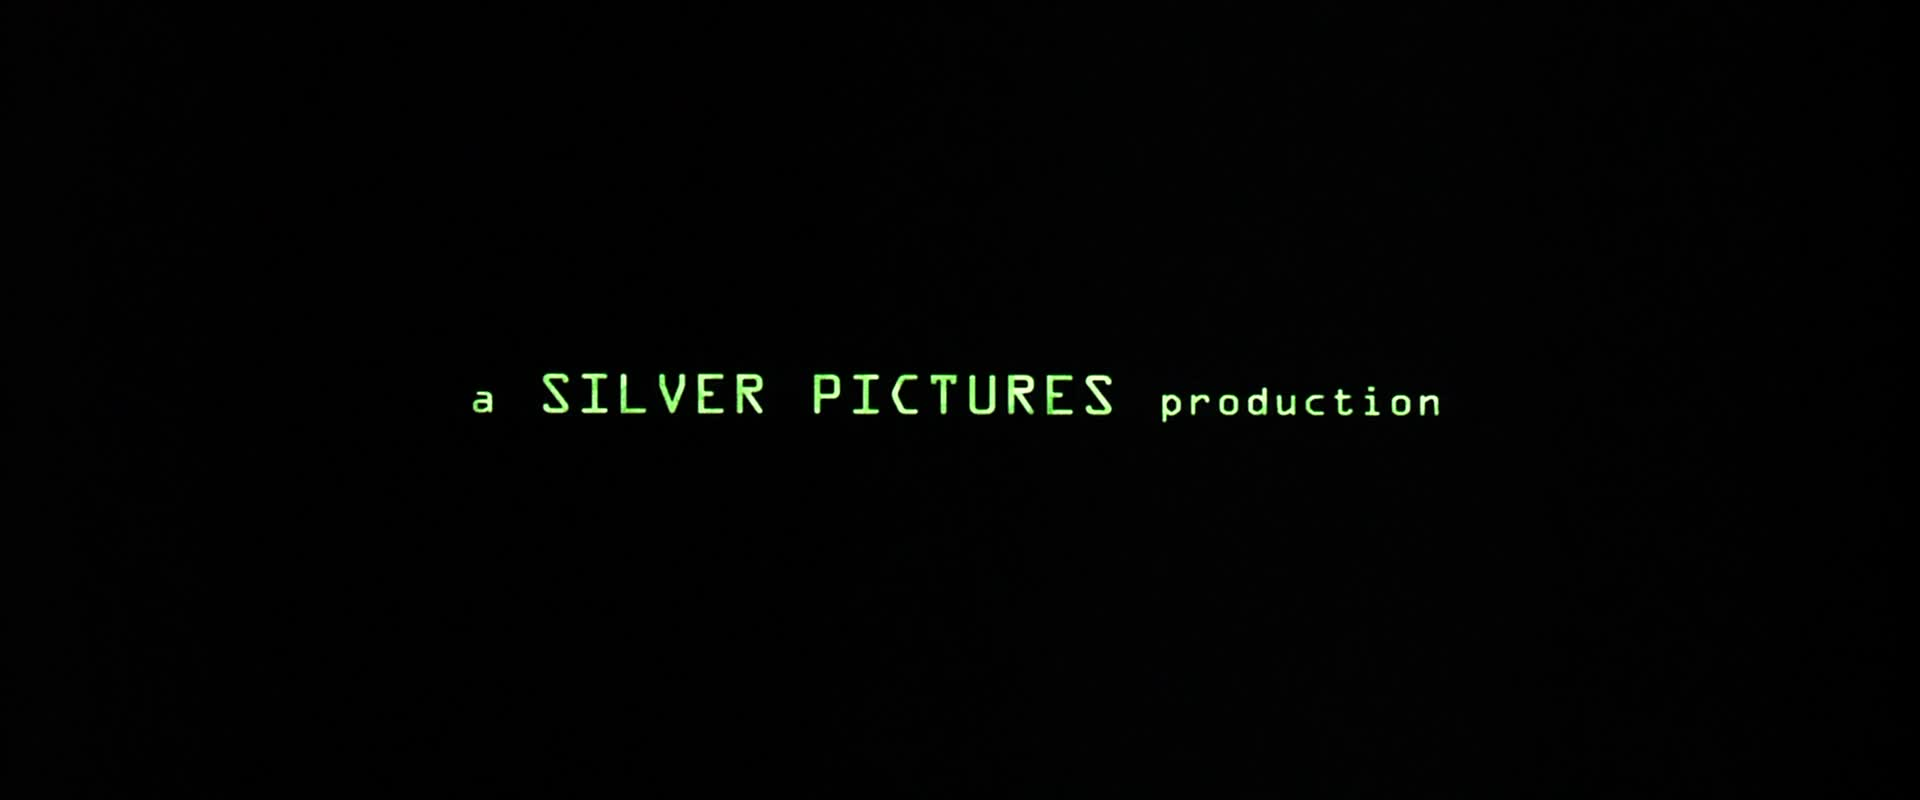 MWM132 Filmanalyse